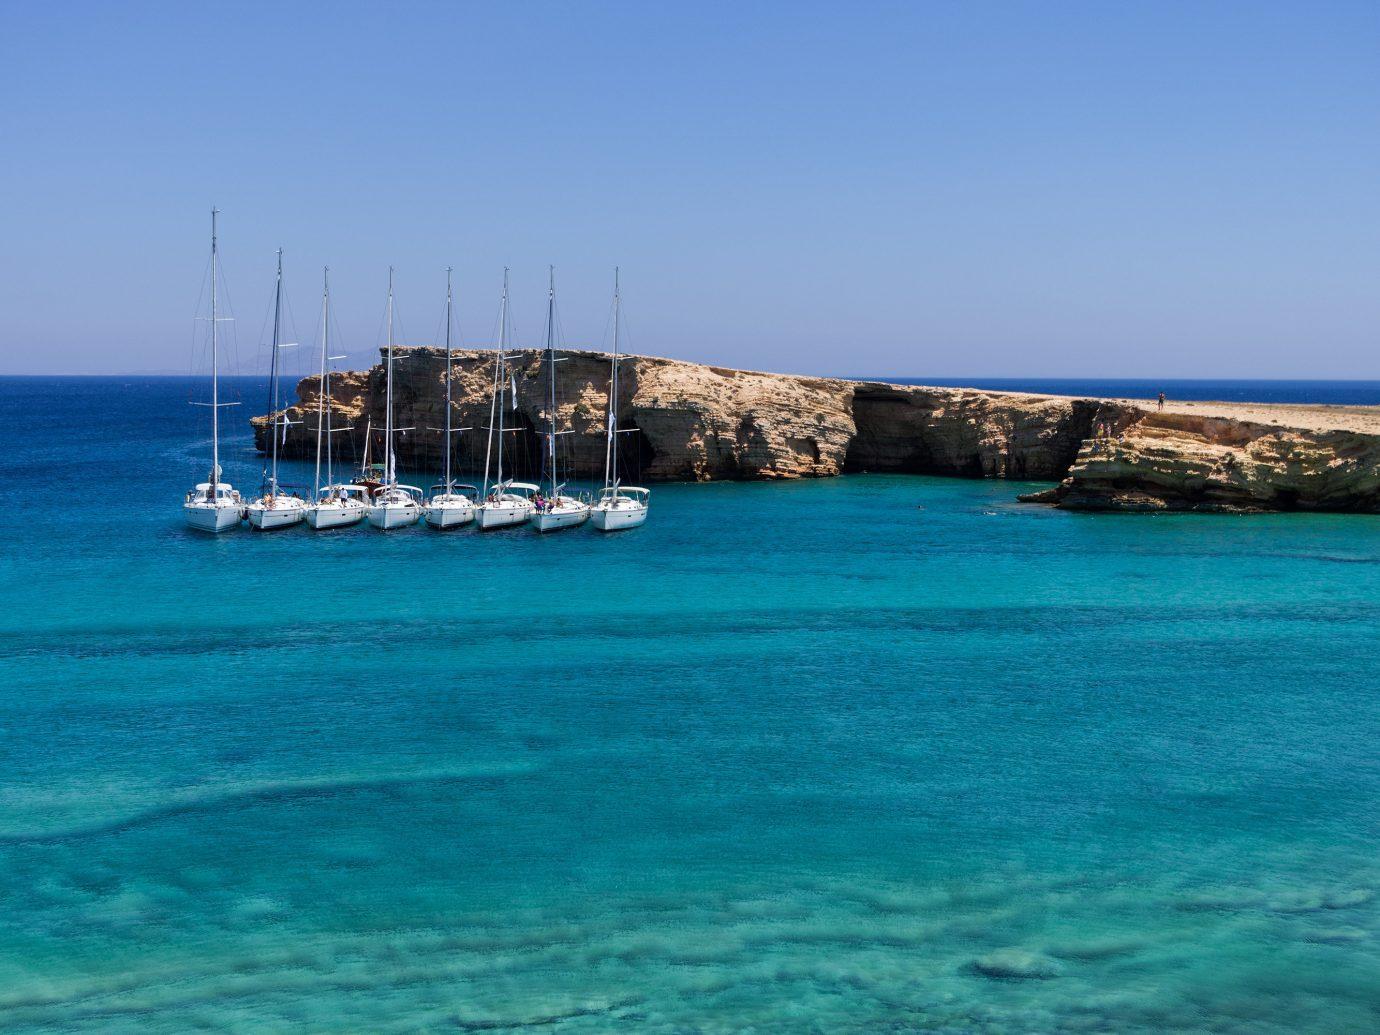 Trip Ideas sky water outdoor Sea coastal and oceanic landforms Coast azure Island bay horizon blue vacation calm Boat inlet